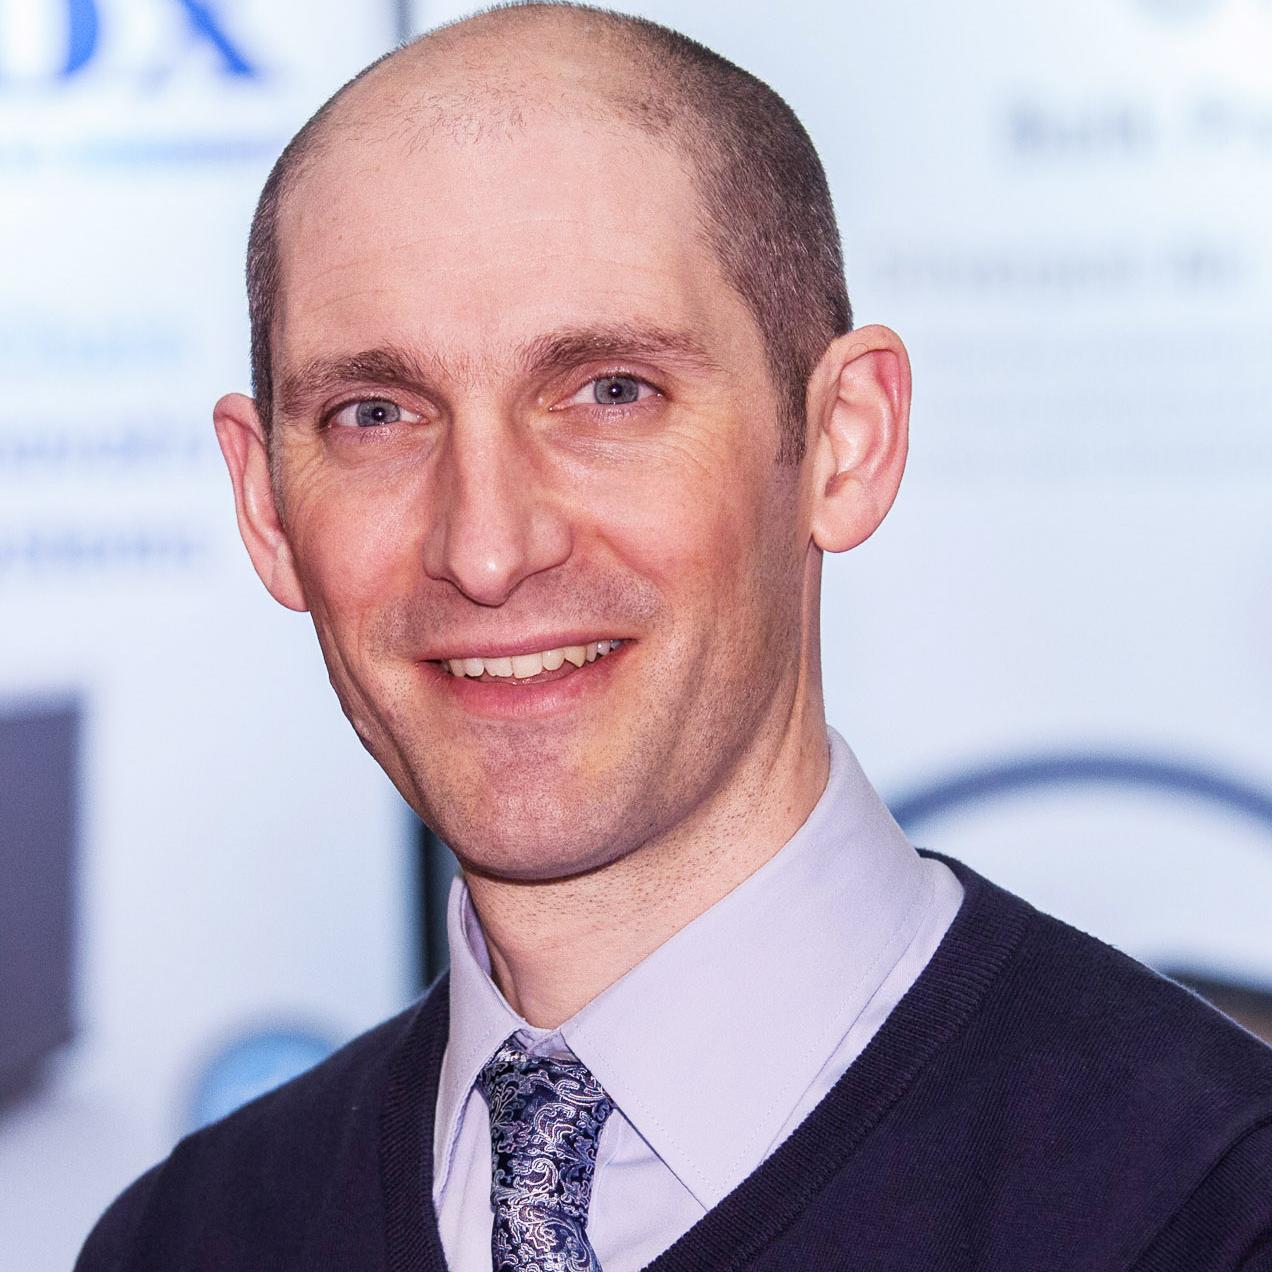 Richard Wood, Technical Director at Softbox